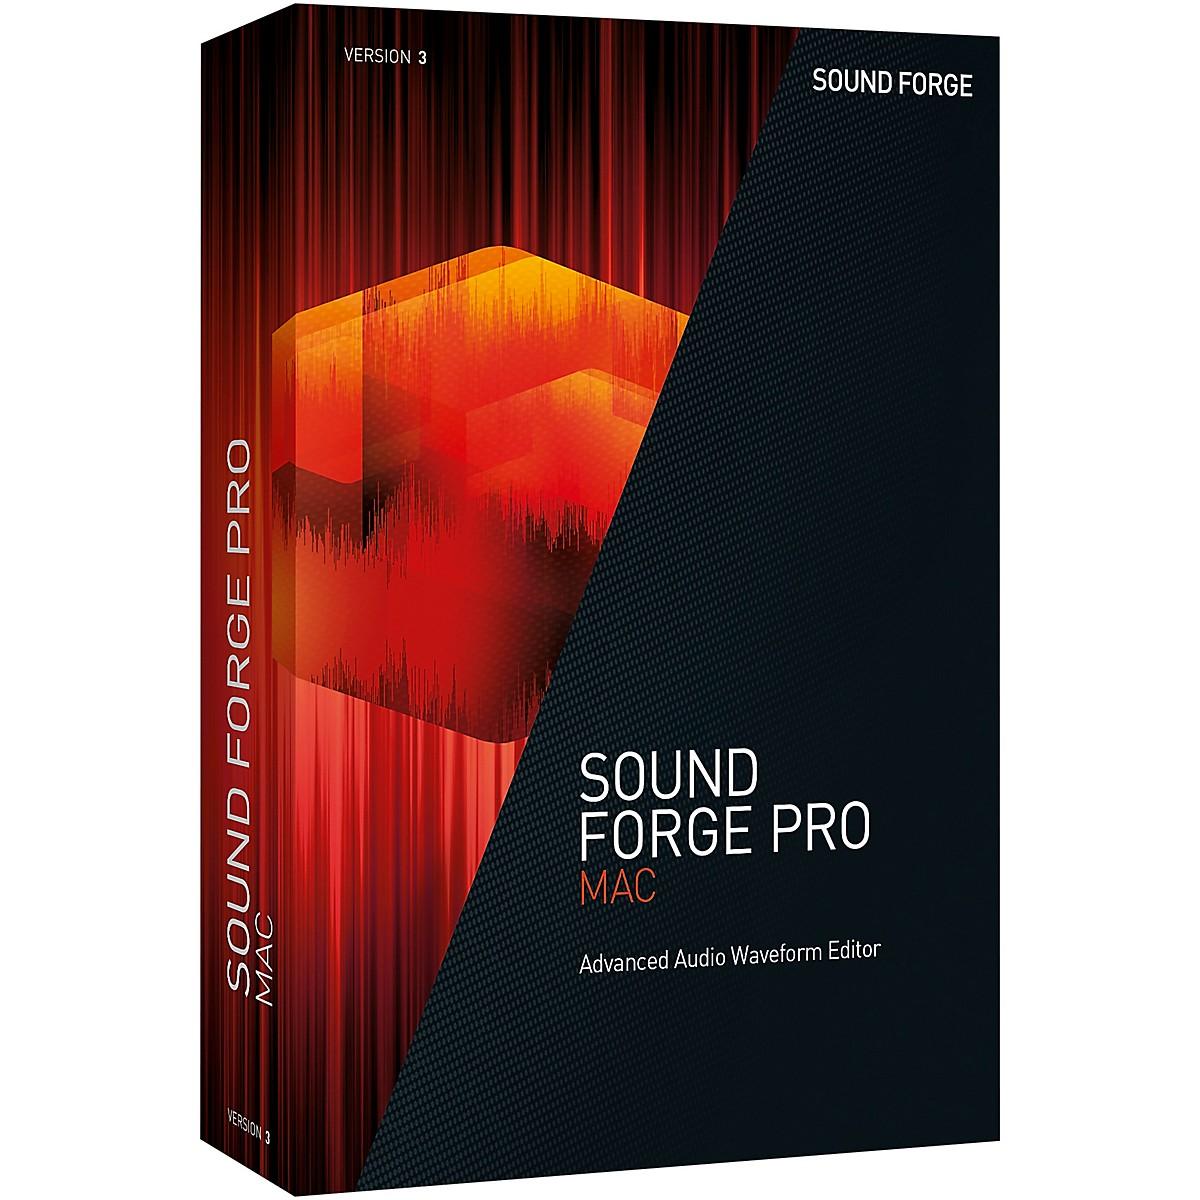 Magix SOUND FORGE Pro Mac 3 Upgrade